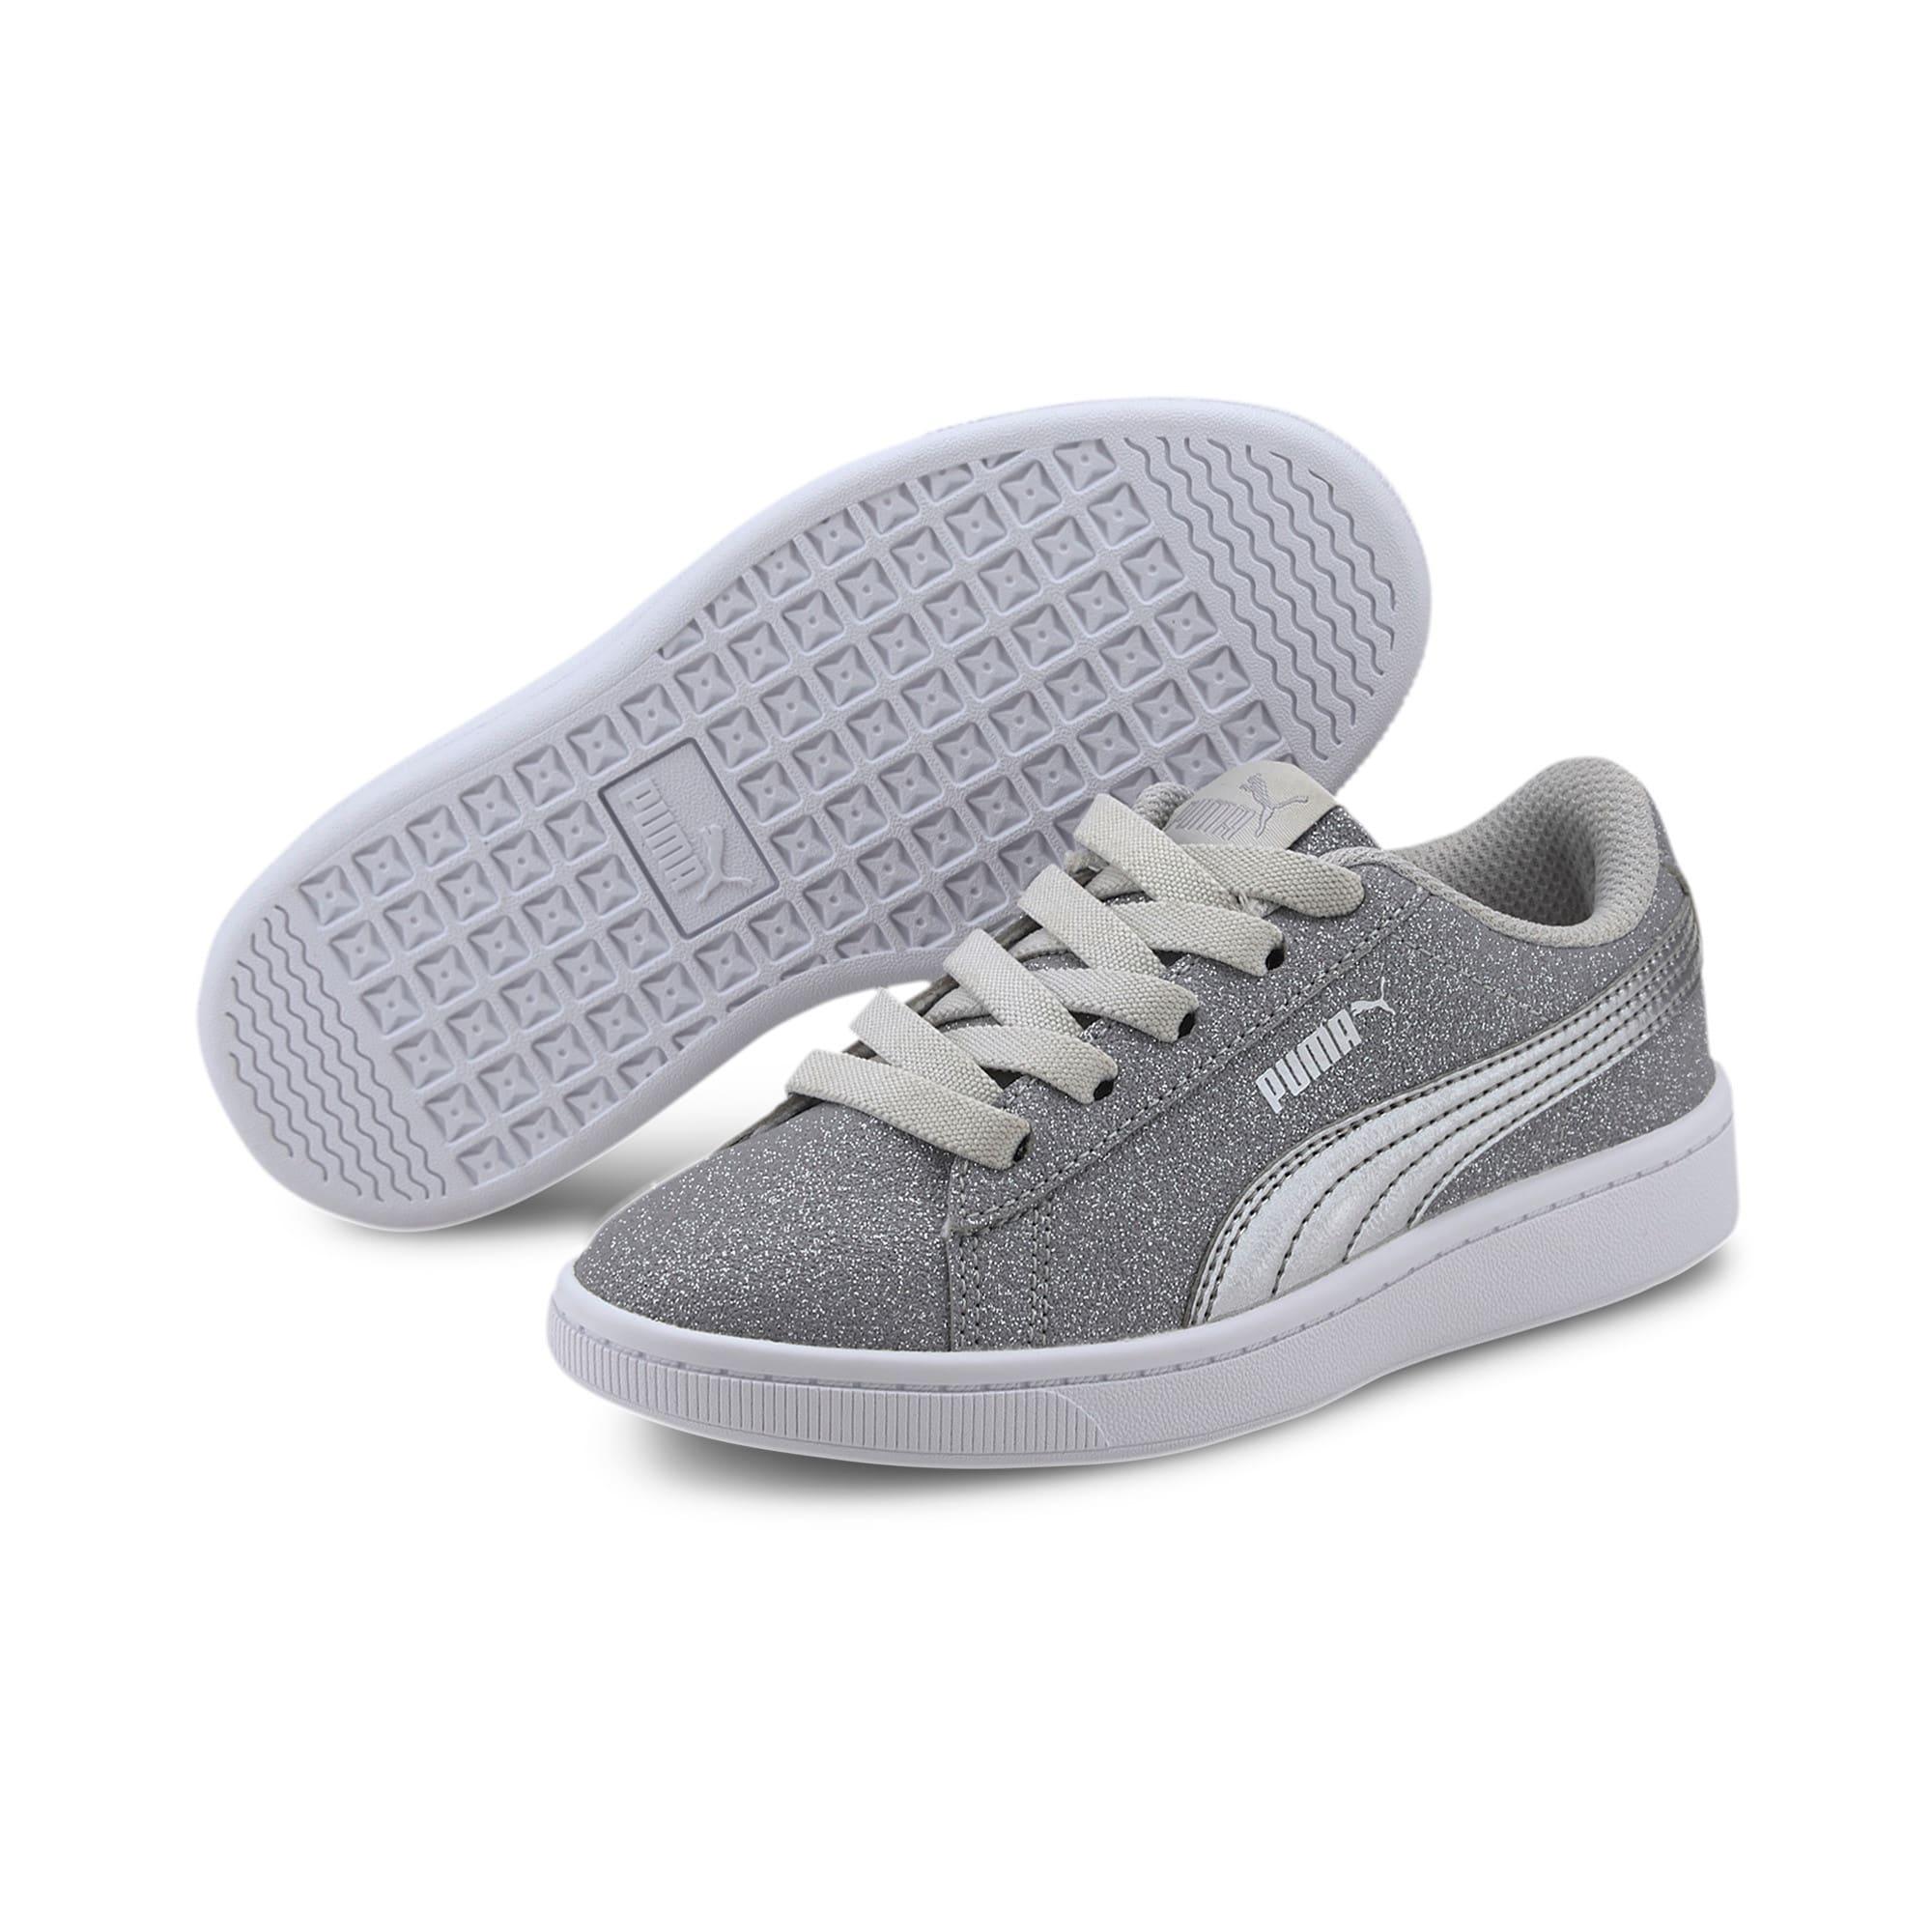 Thumbnail 2 of PUMA Vikky v2 Glitz AC Sneakers PS, Gray Violet-Silver-White, medium